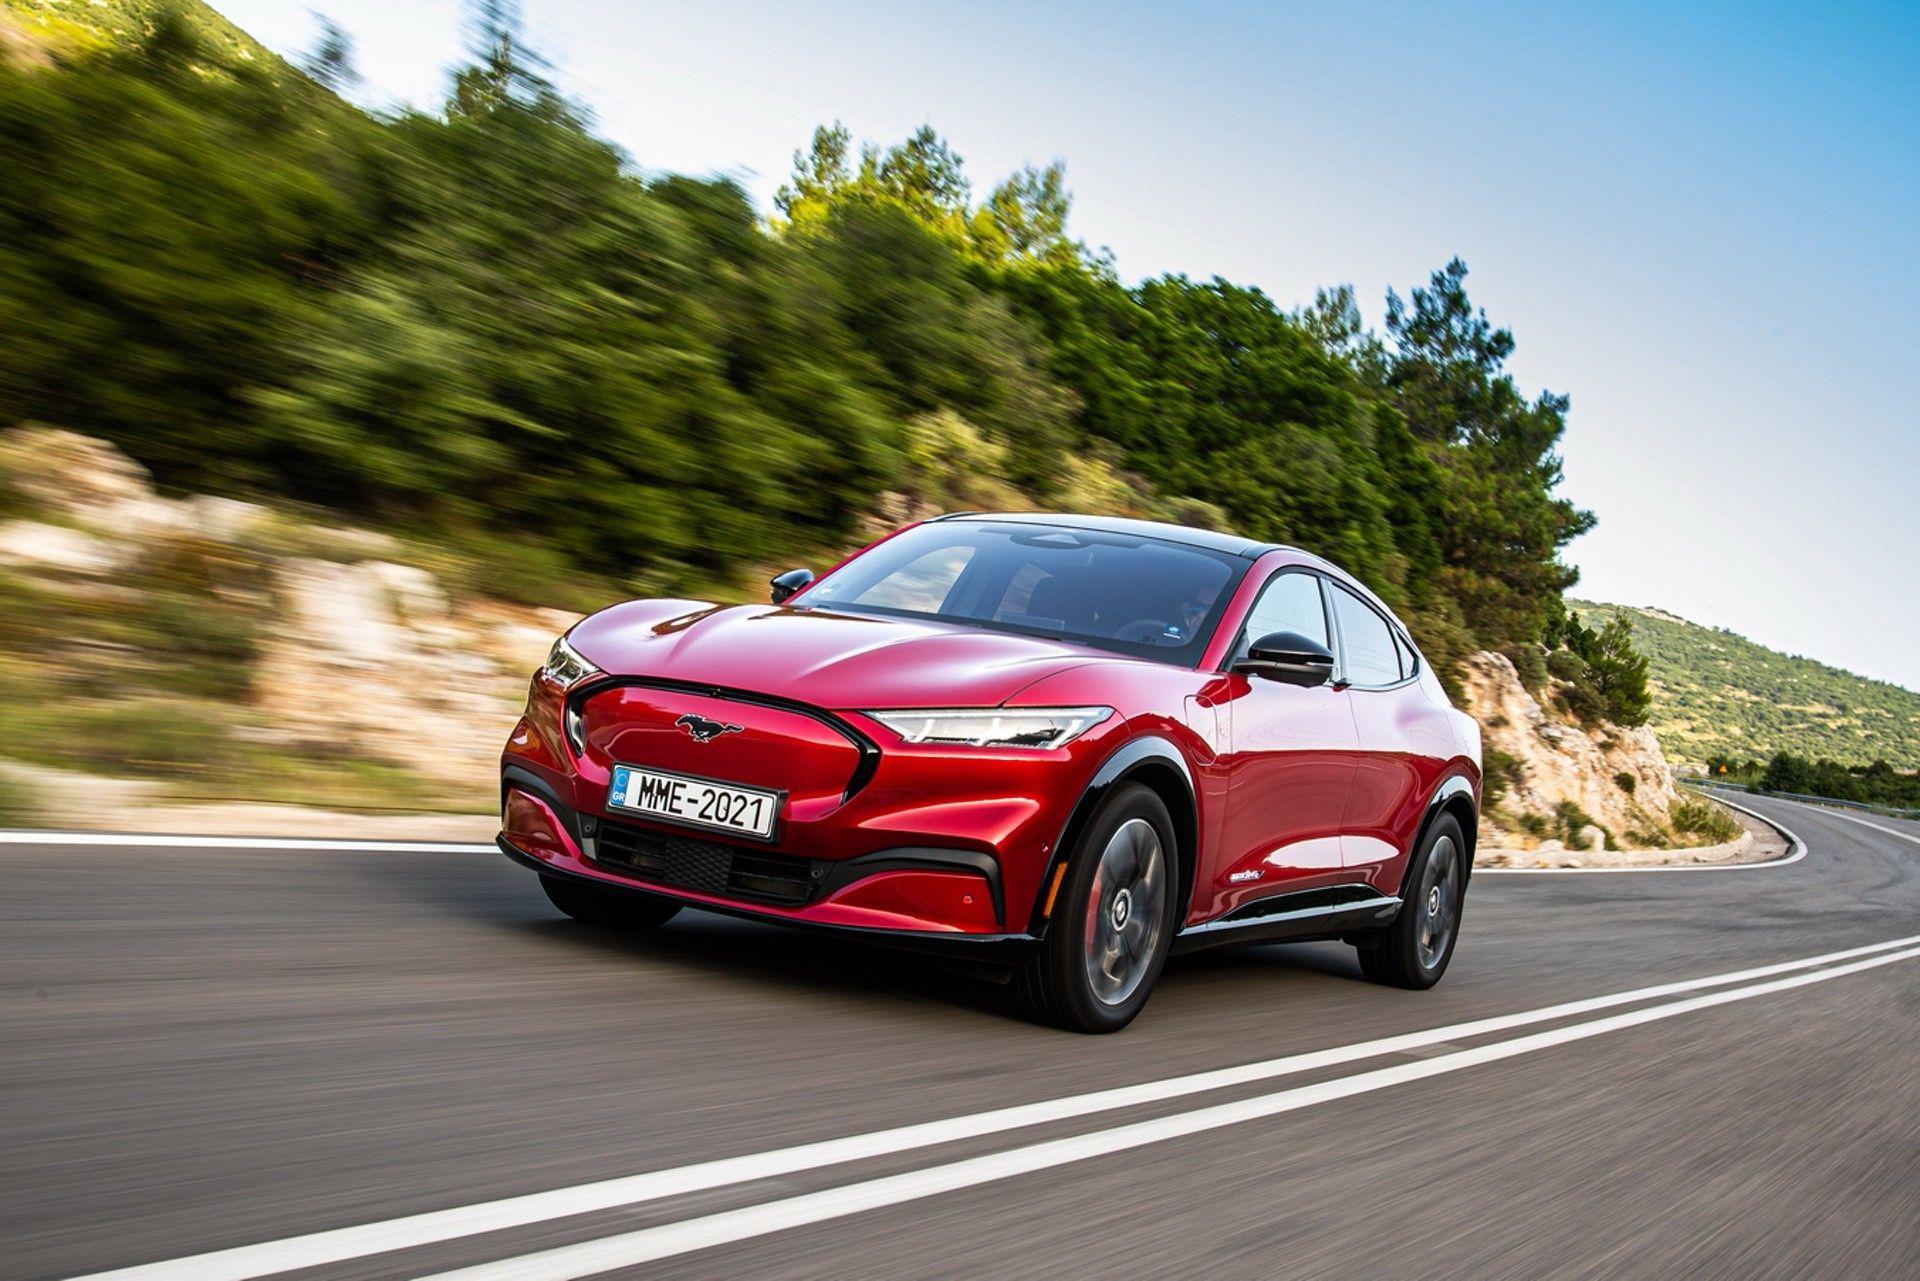 Ford_Mustang_Mach-E_greek_presskit-0132